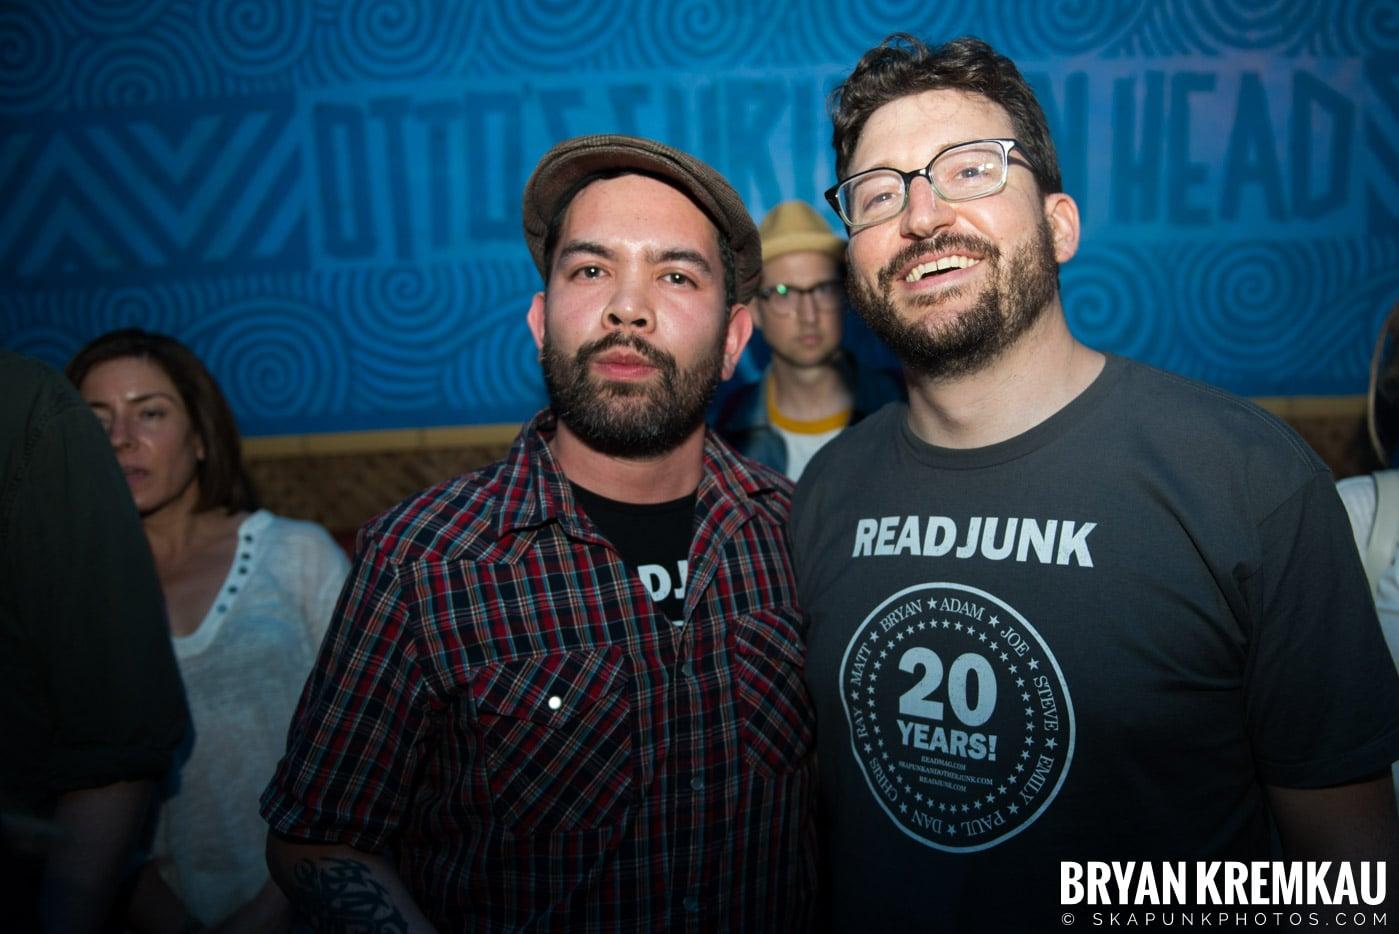 ReadJunk.com 20th Anniversary Party @ Otto's Shrunken Head, NYC - 4.29.17 (5)